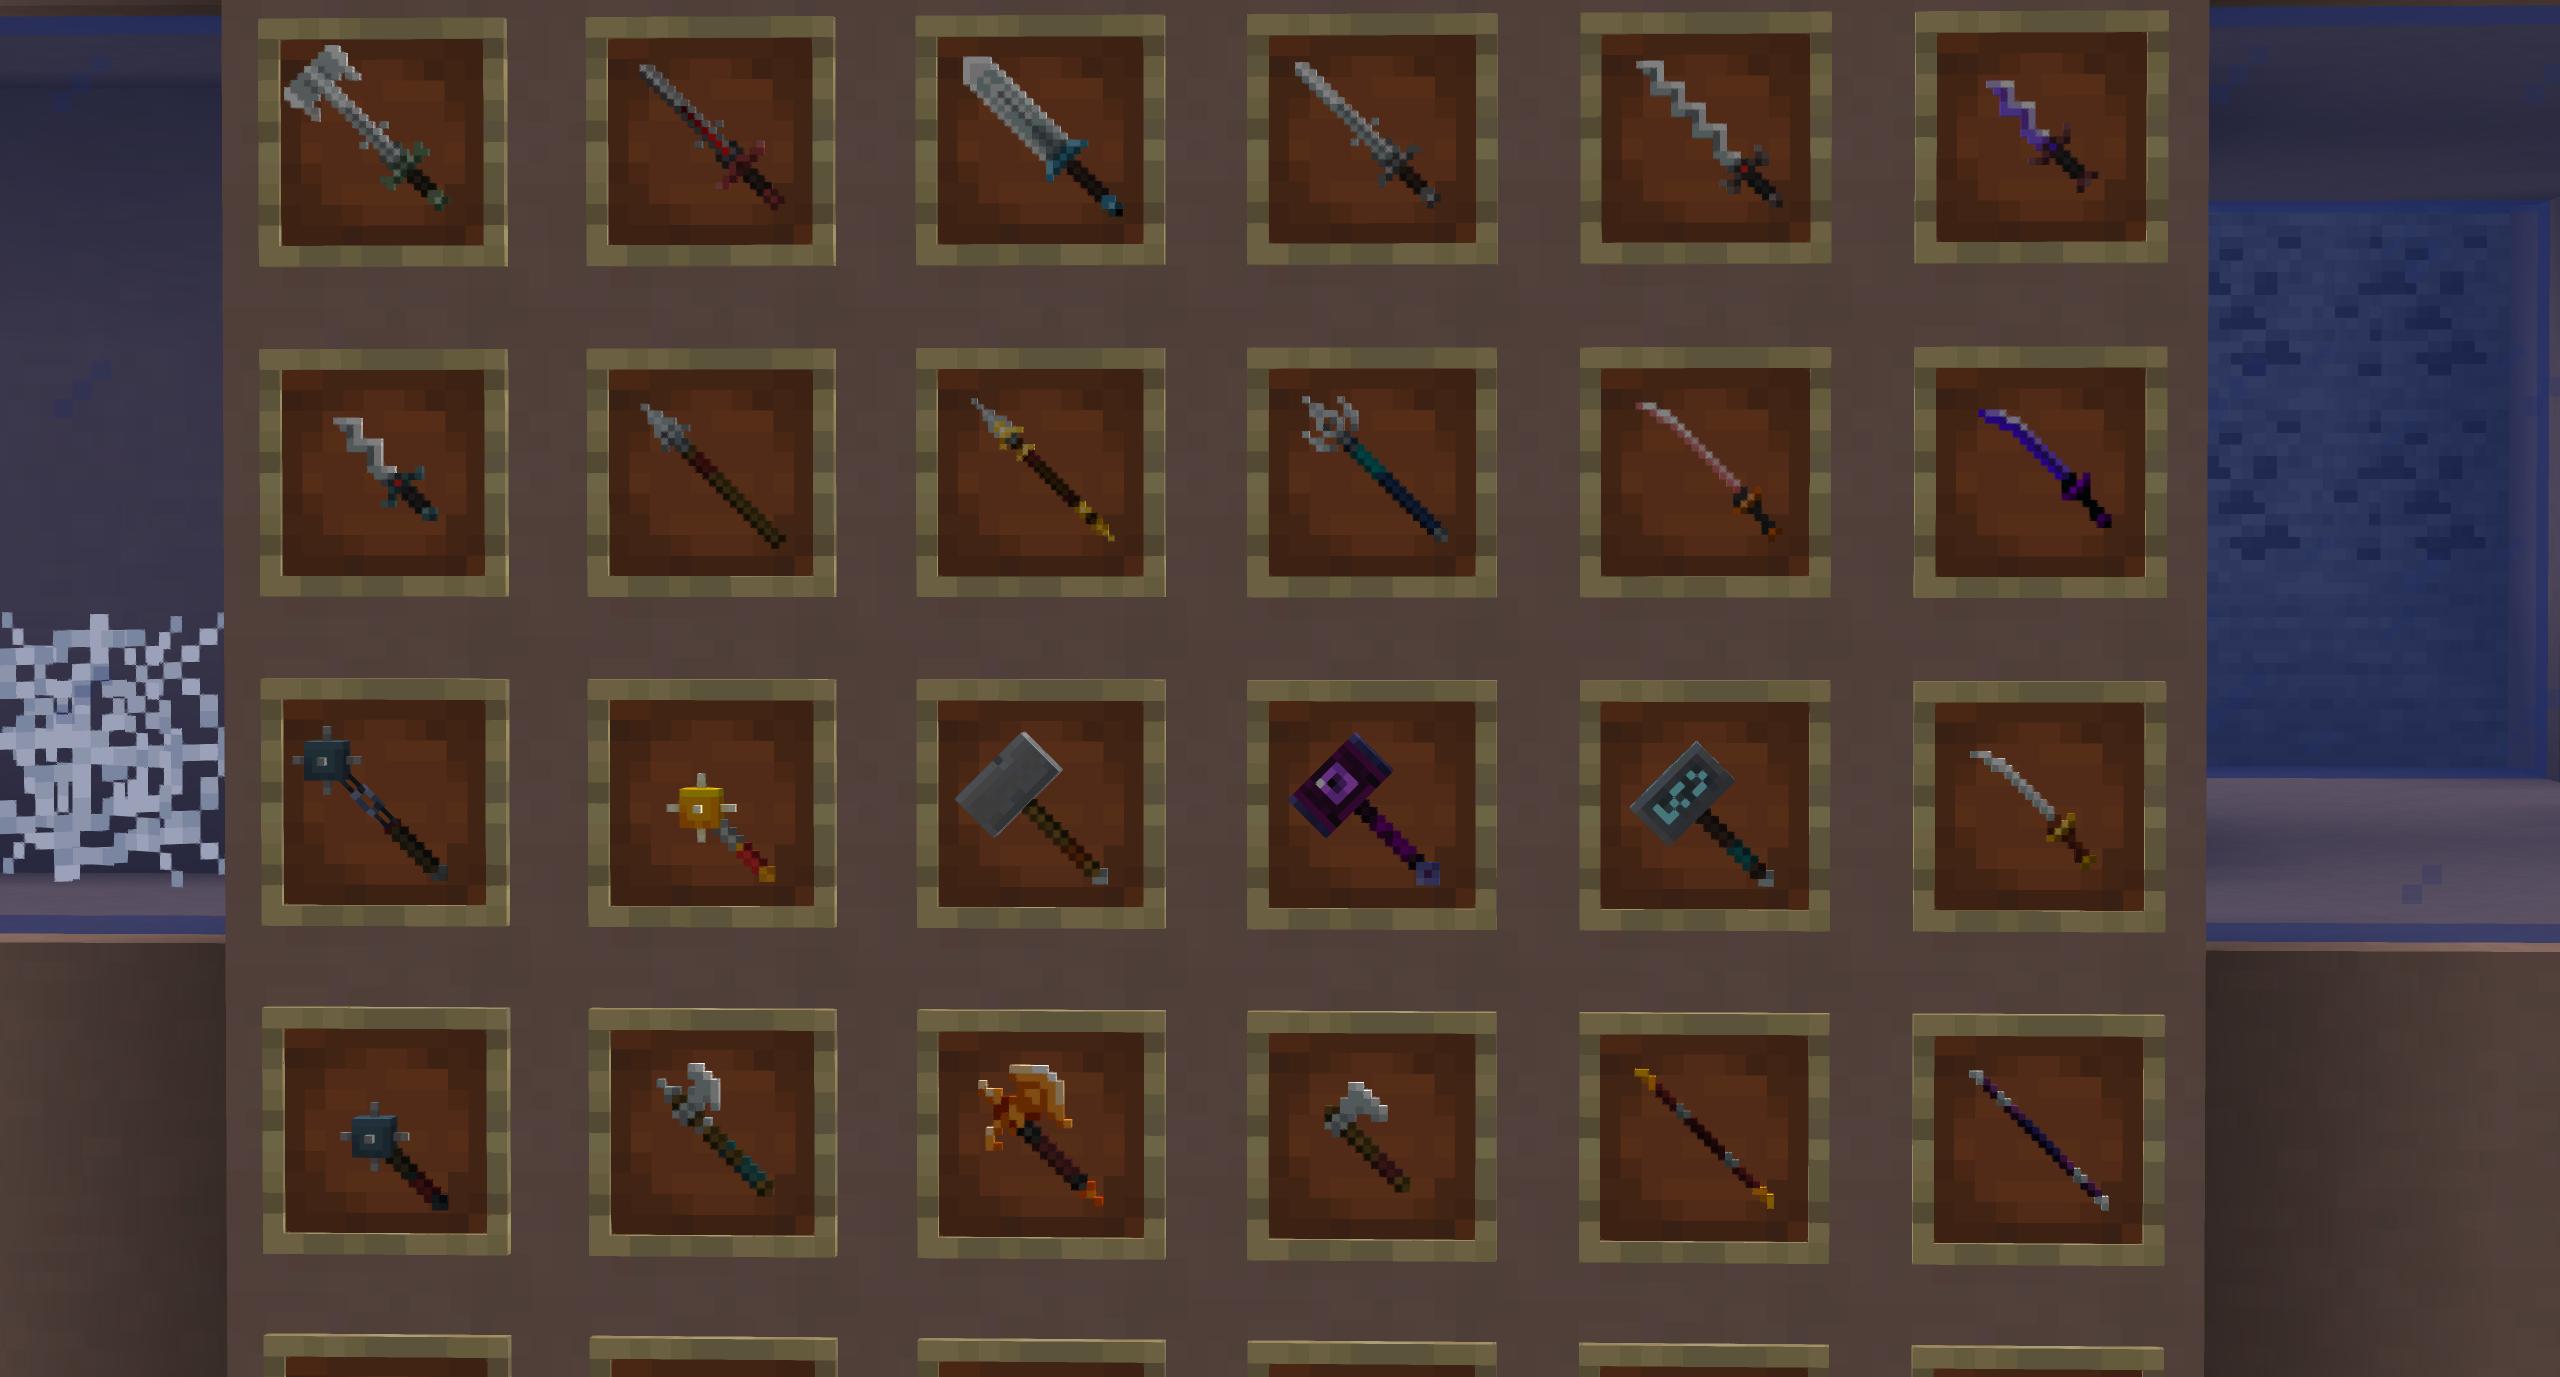 Мод «Dungeons Gear» (Оружие, доспехи) - скриншот 6